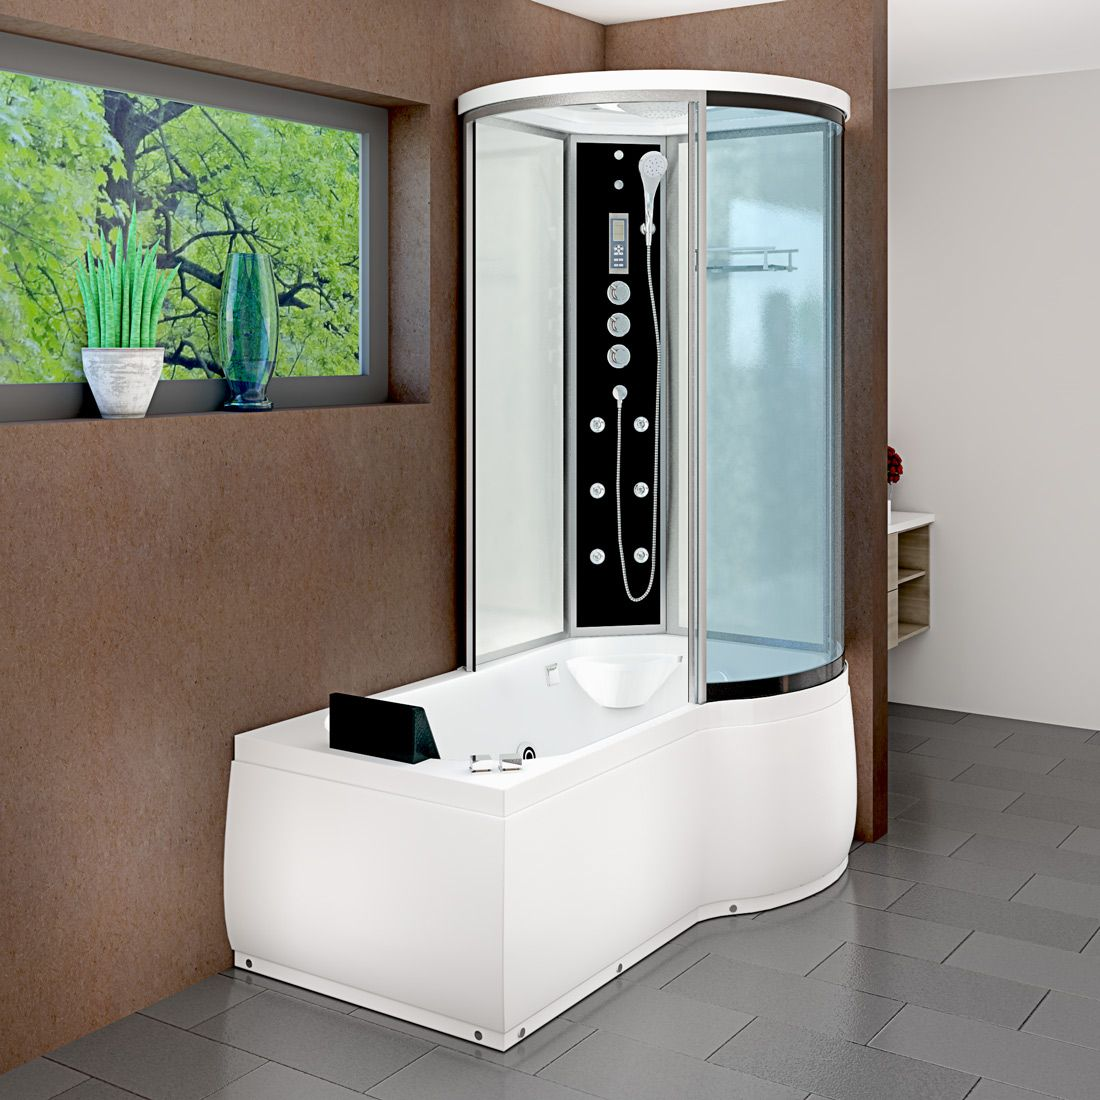 Badezimmer ideen whirlpool acquavapore dtpws whirlpool badewanne dusche duschkabine